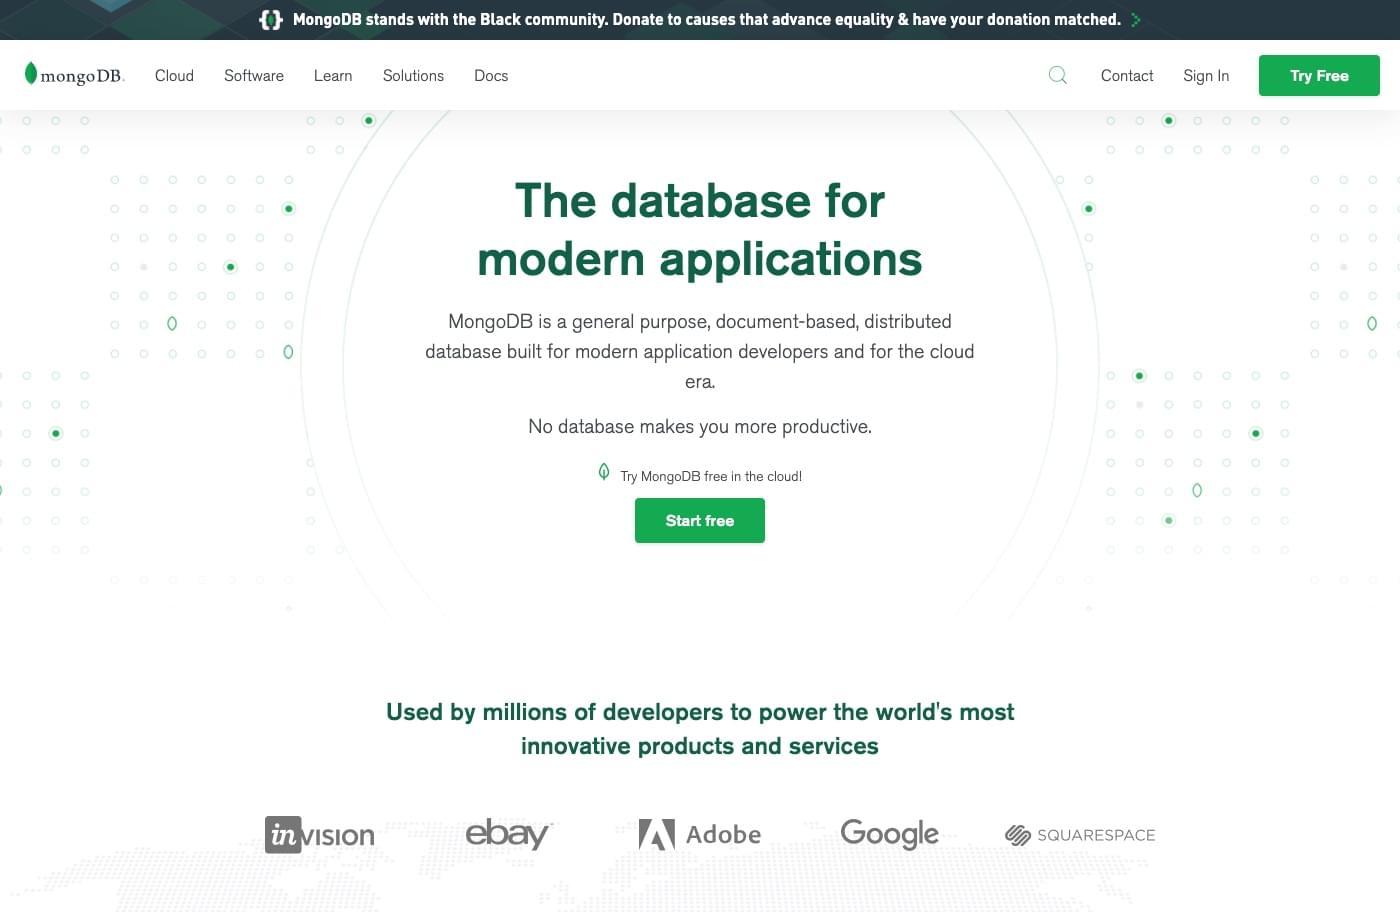 MongoDb - پروژه های جدید را سریعتر شروع کنید